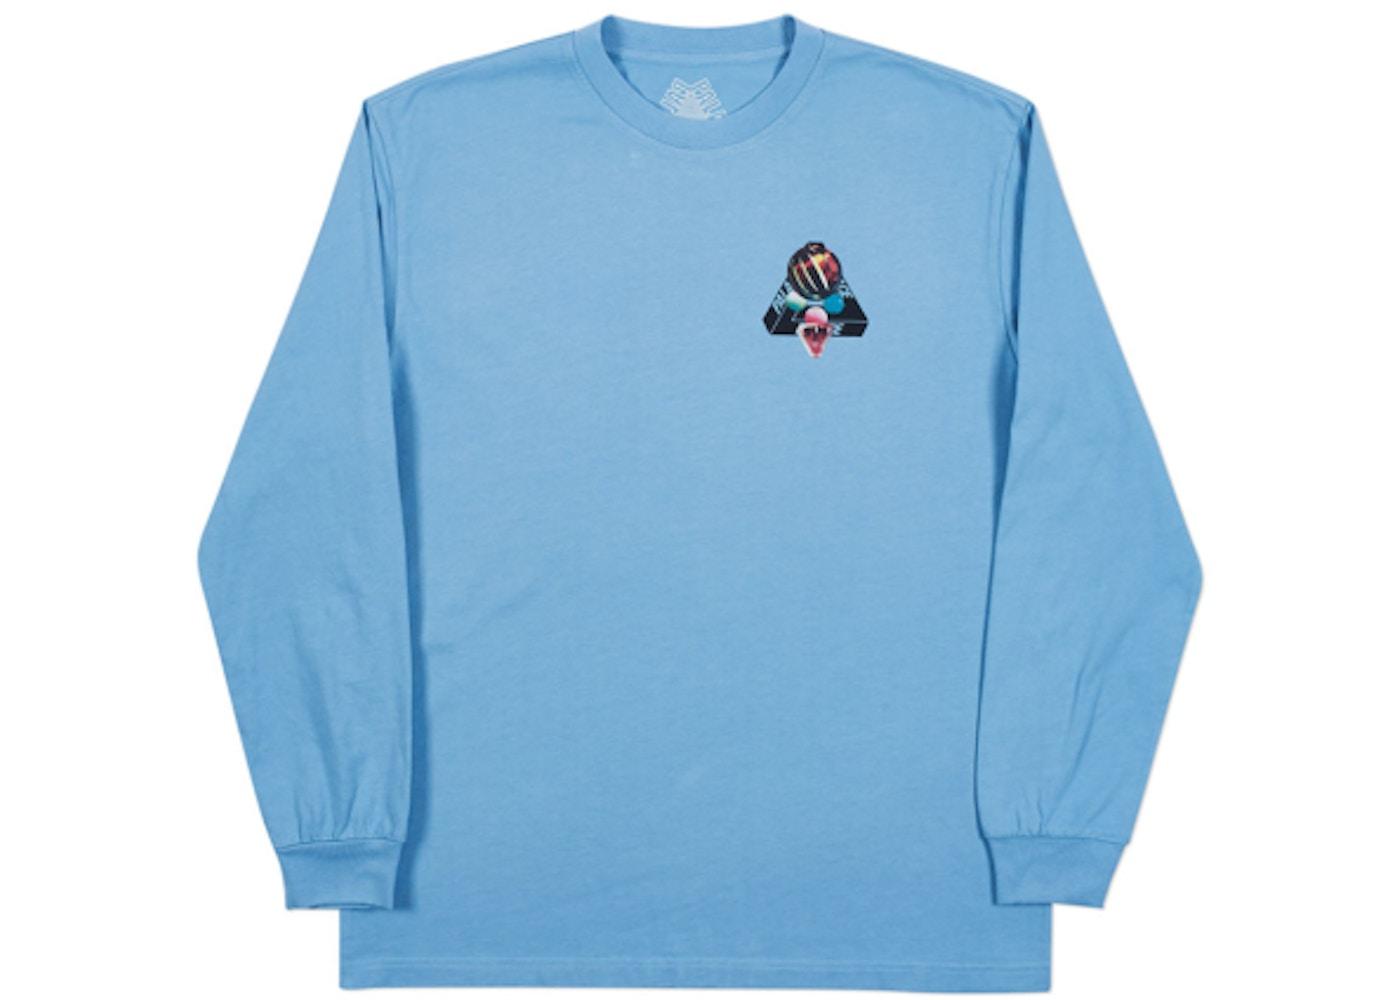 43fb62a4f9 Palace Sans Ferg Longsleeve T-Shirt Cornflower Blue - SS18